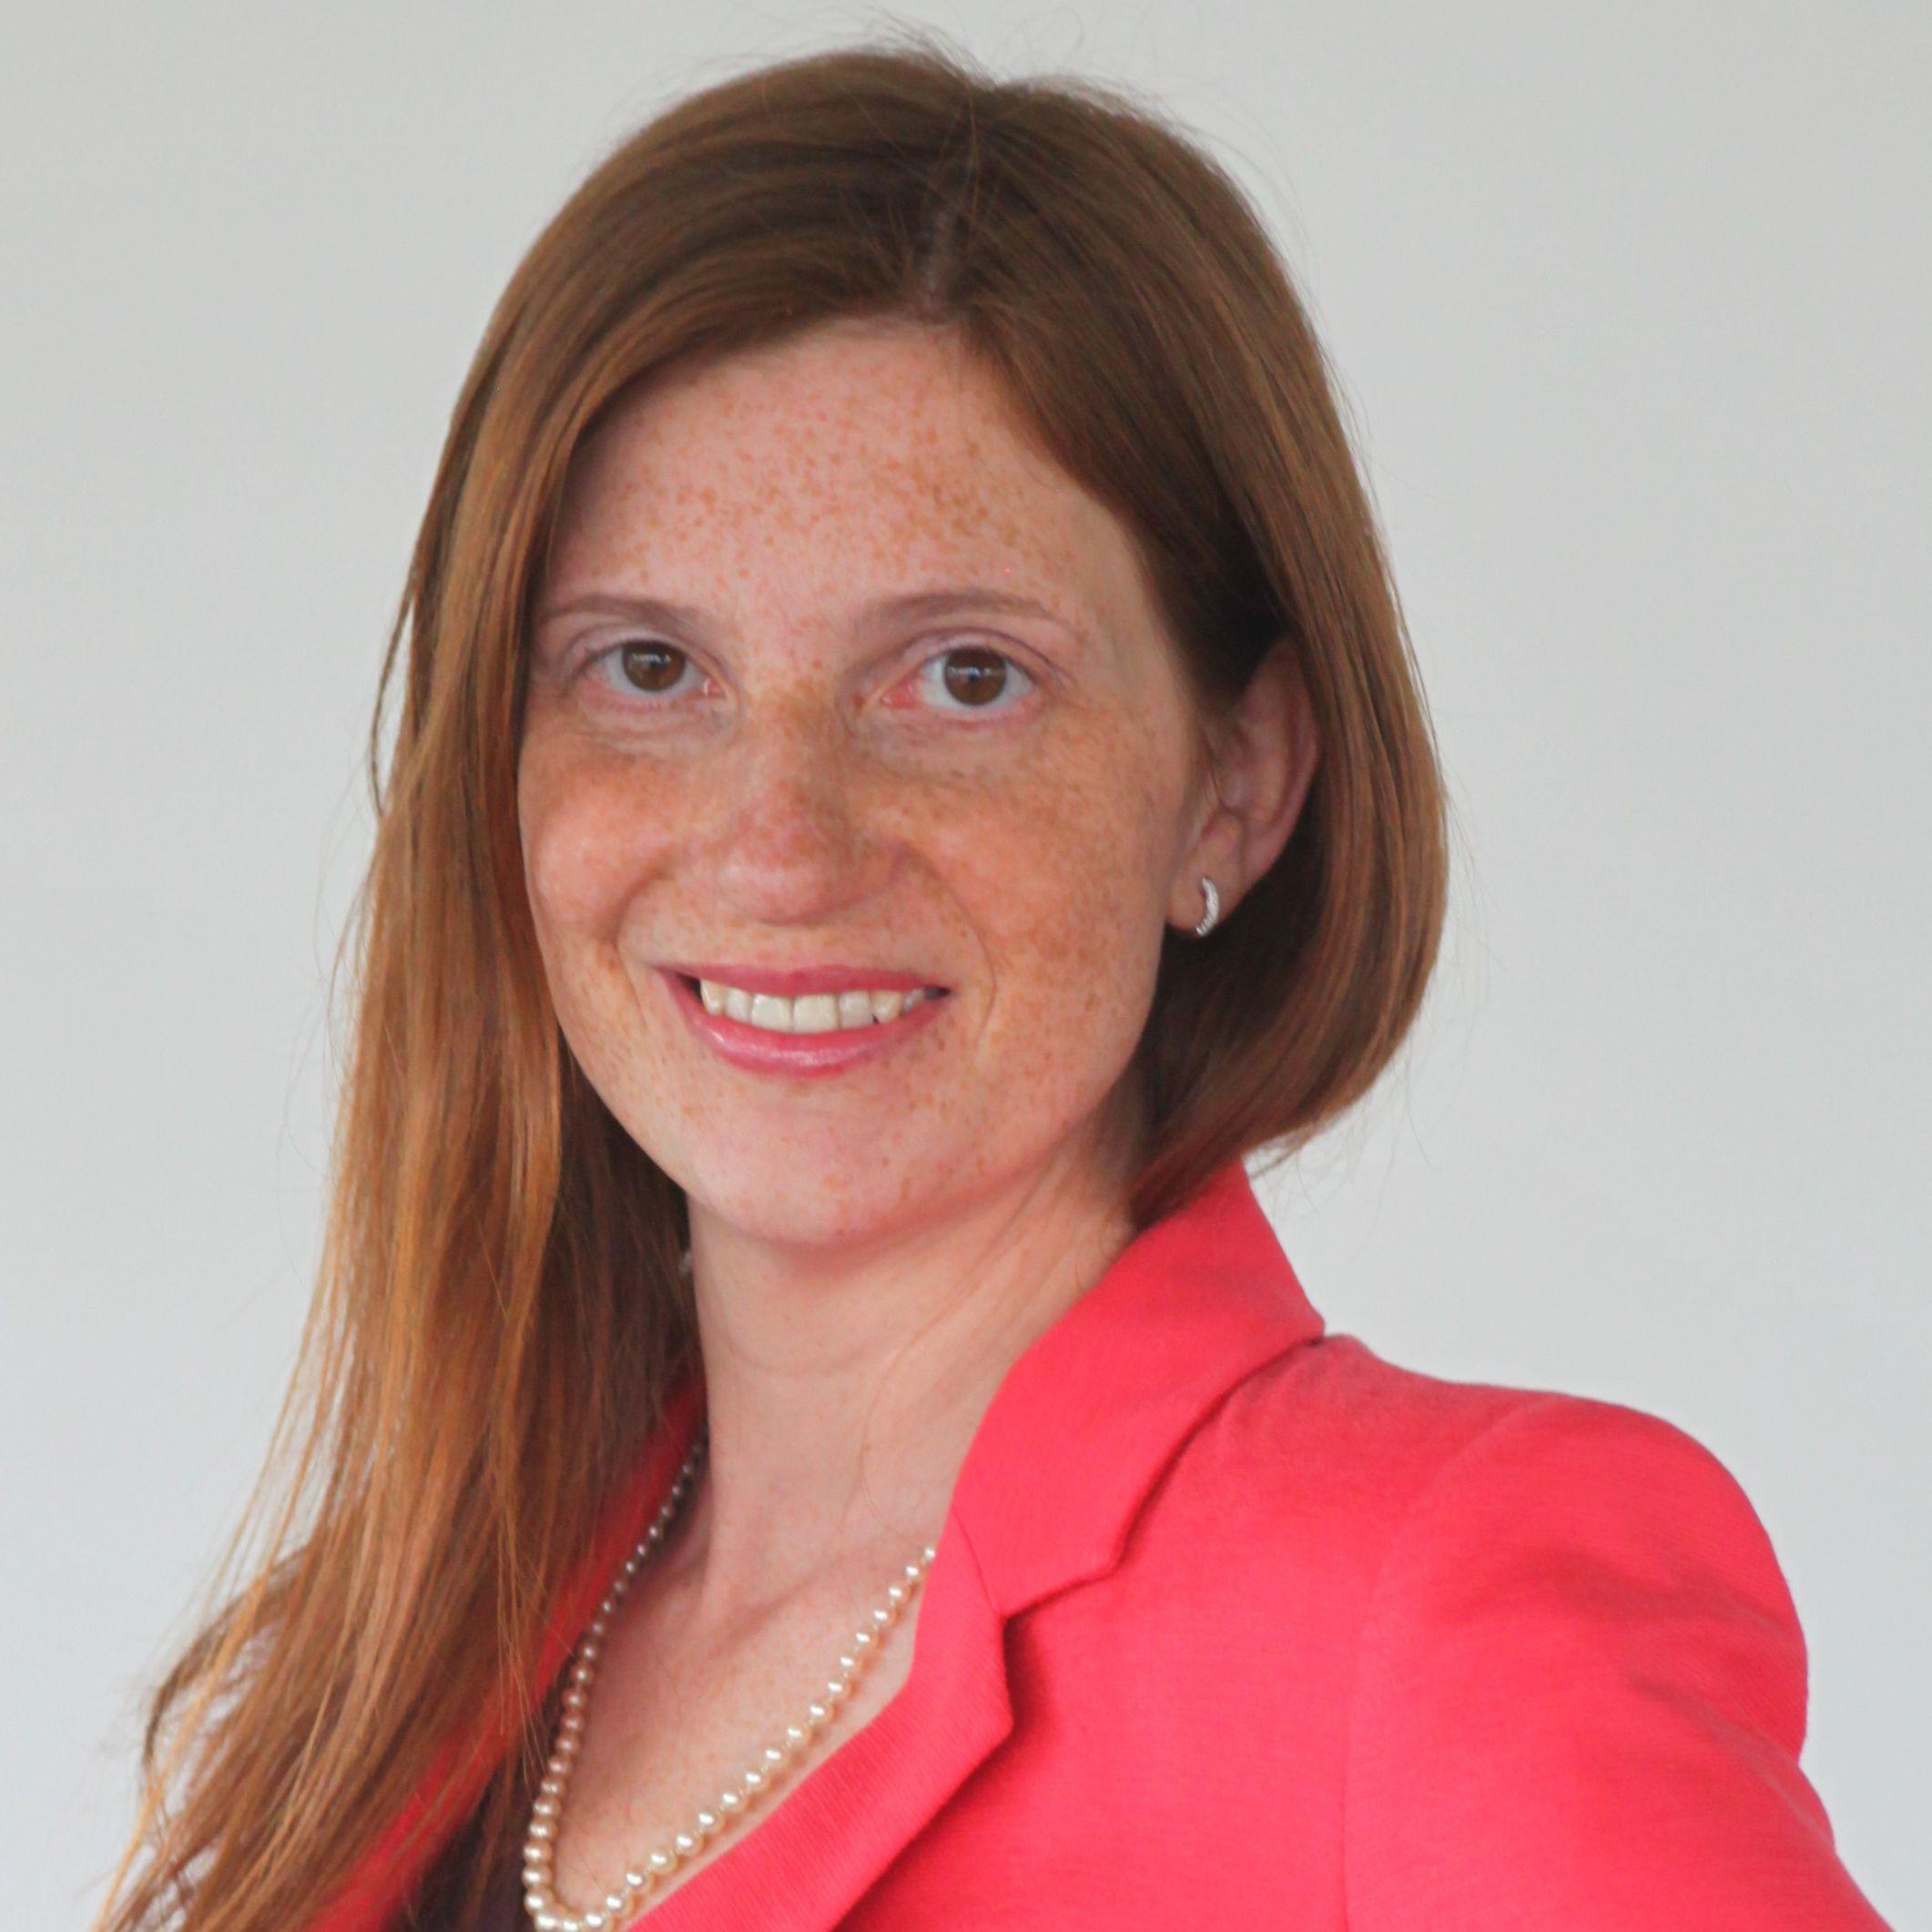 Dr. Ester Spitale, STMicroelectronics